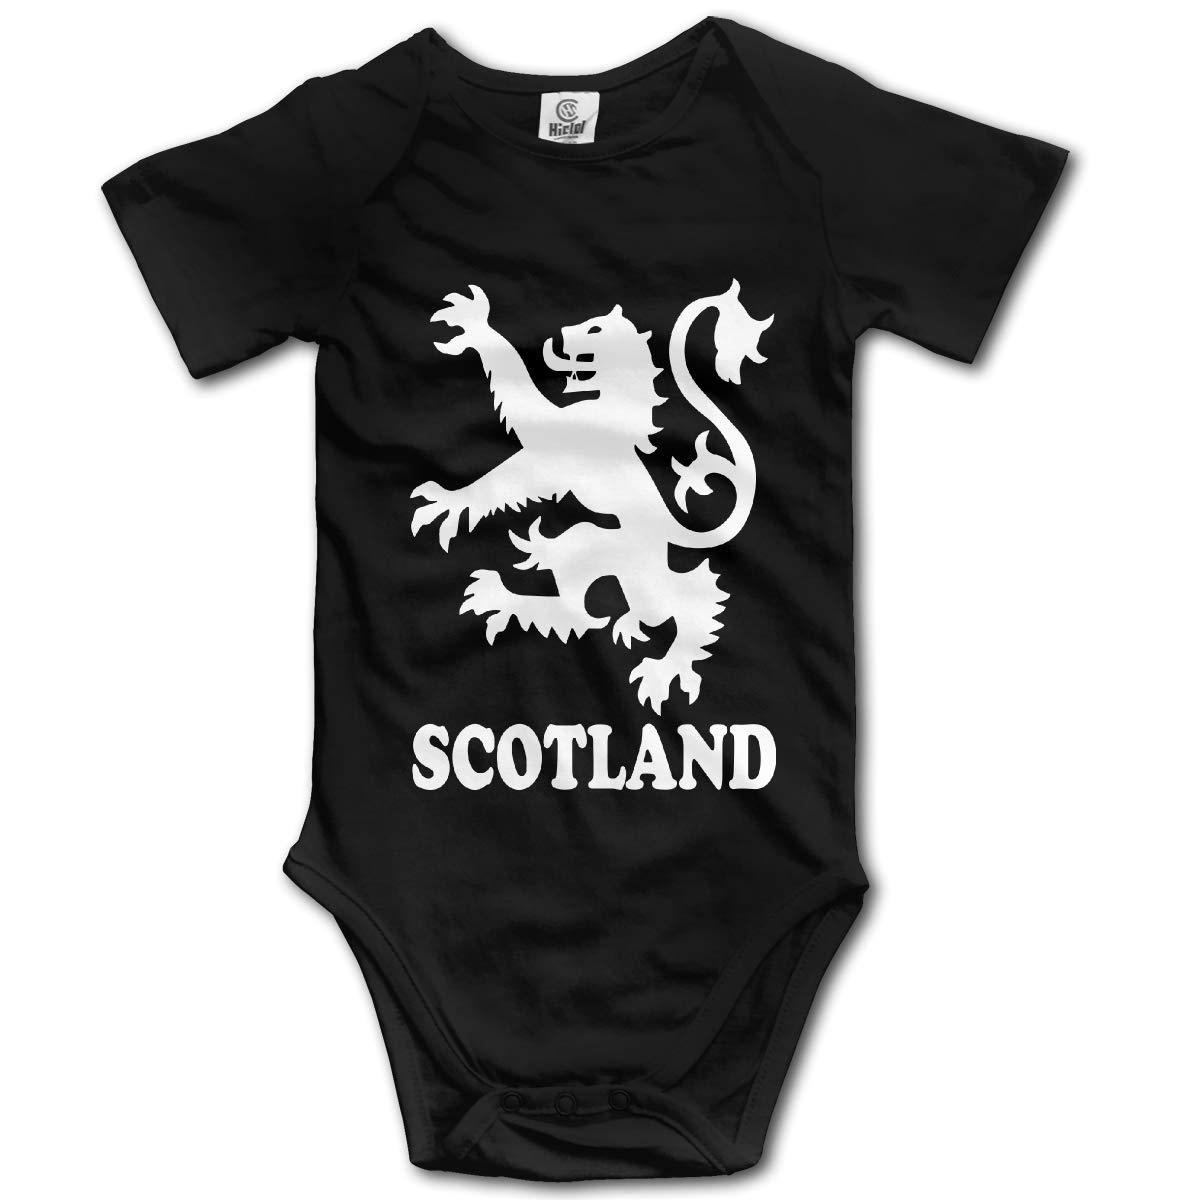 J122 Lion Rampant Scotland Scottish Suit 6-24 Months Baby Short Sleeve Baby Clothes Climbing Clothes